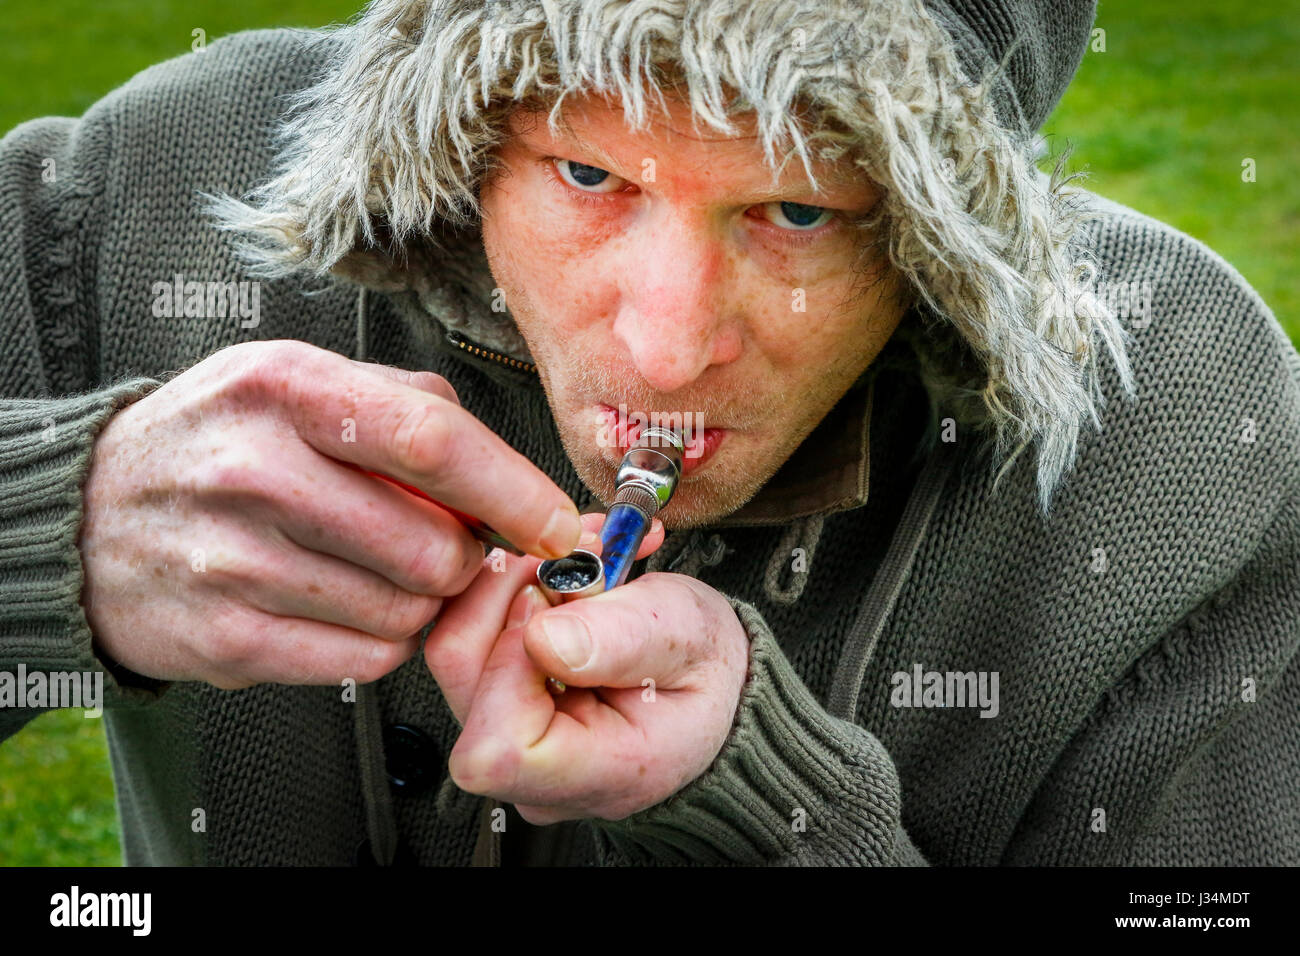 Drug user lighting up his cannabis pipe, Glasgow, Scotland, UK - Stock Image